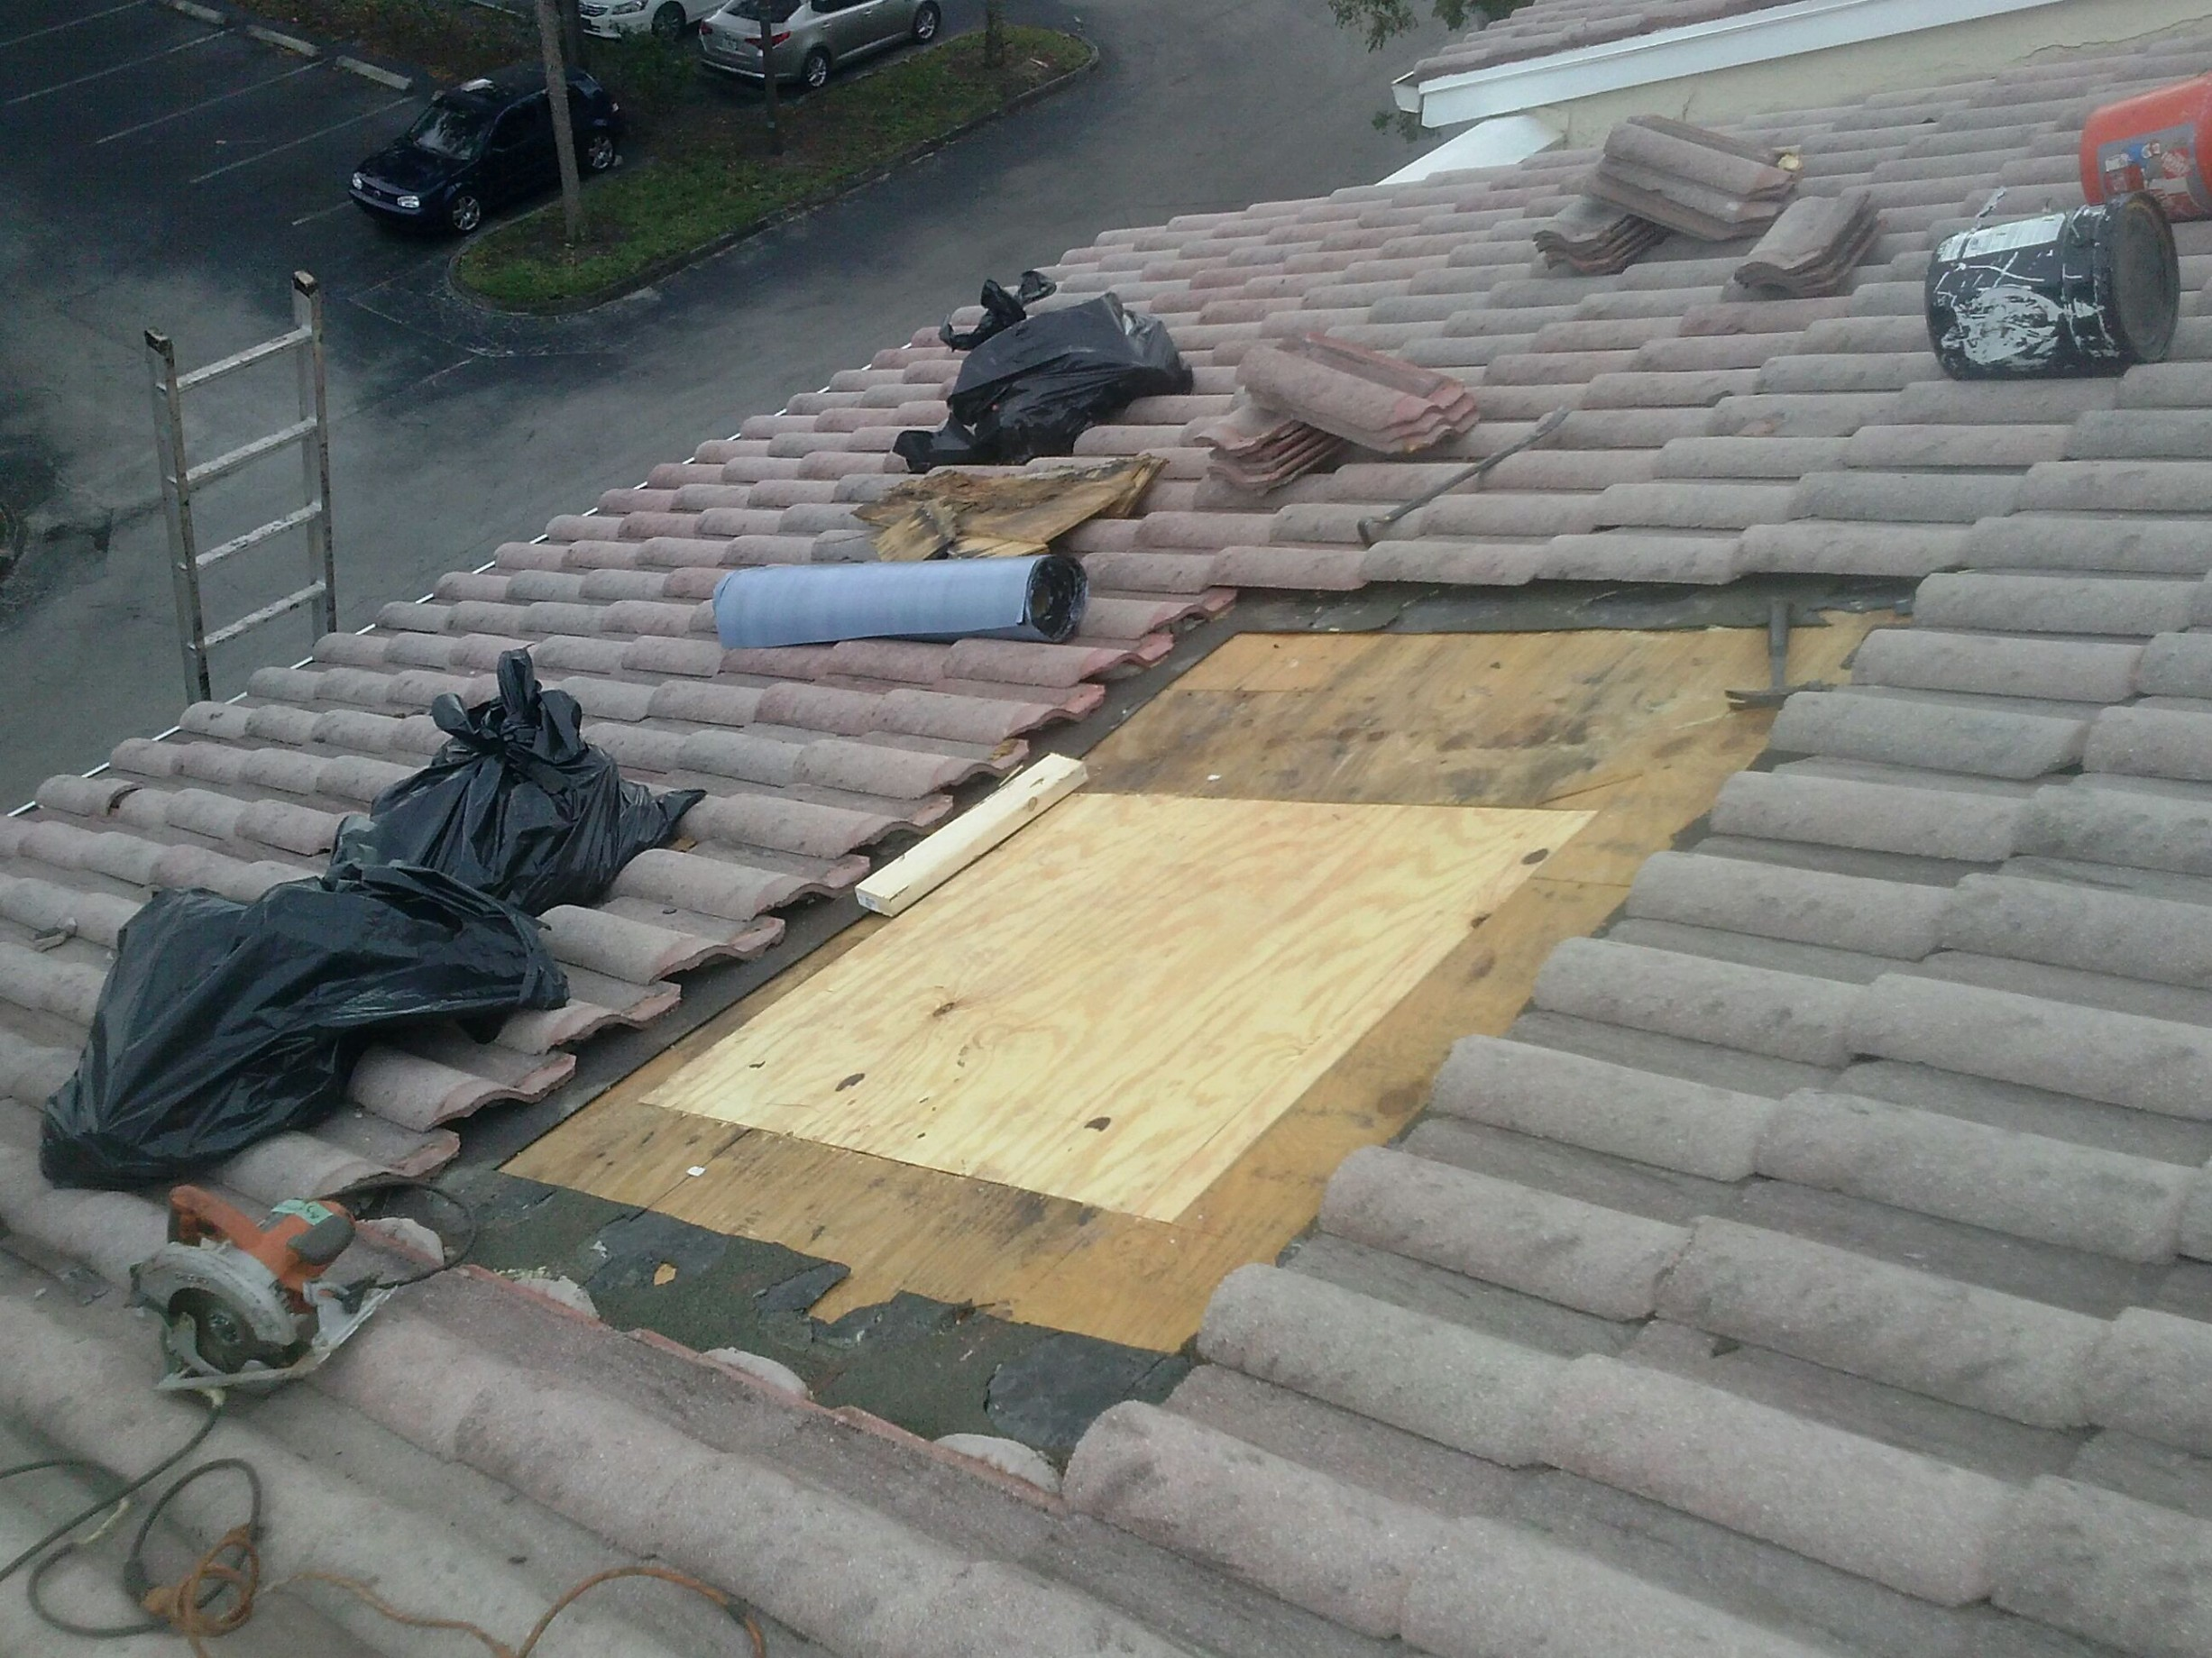 tile roof repair boca raton preventive maintenance. Black Bedroom Furniture Sets. Home Design Ideas